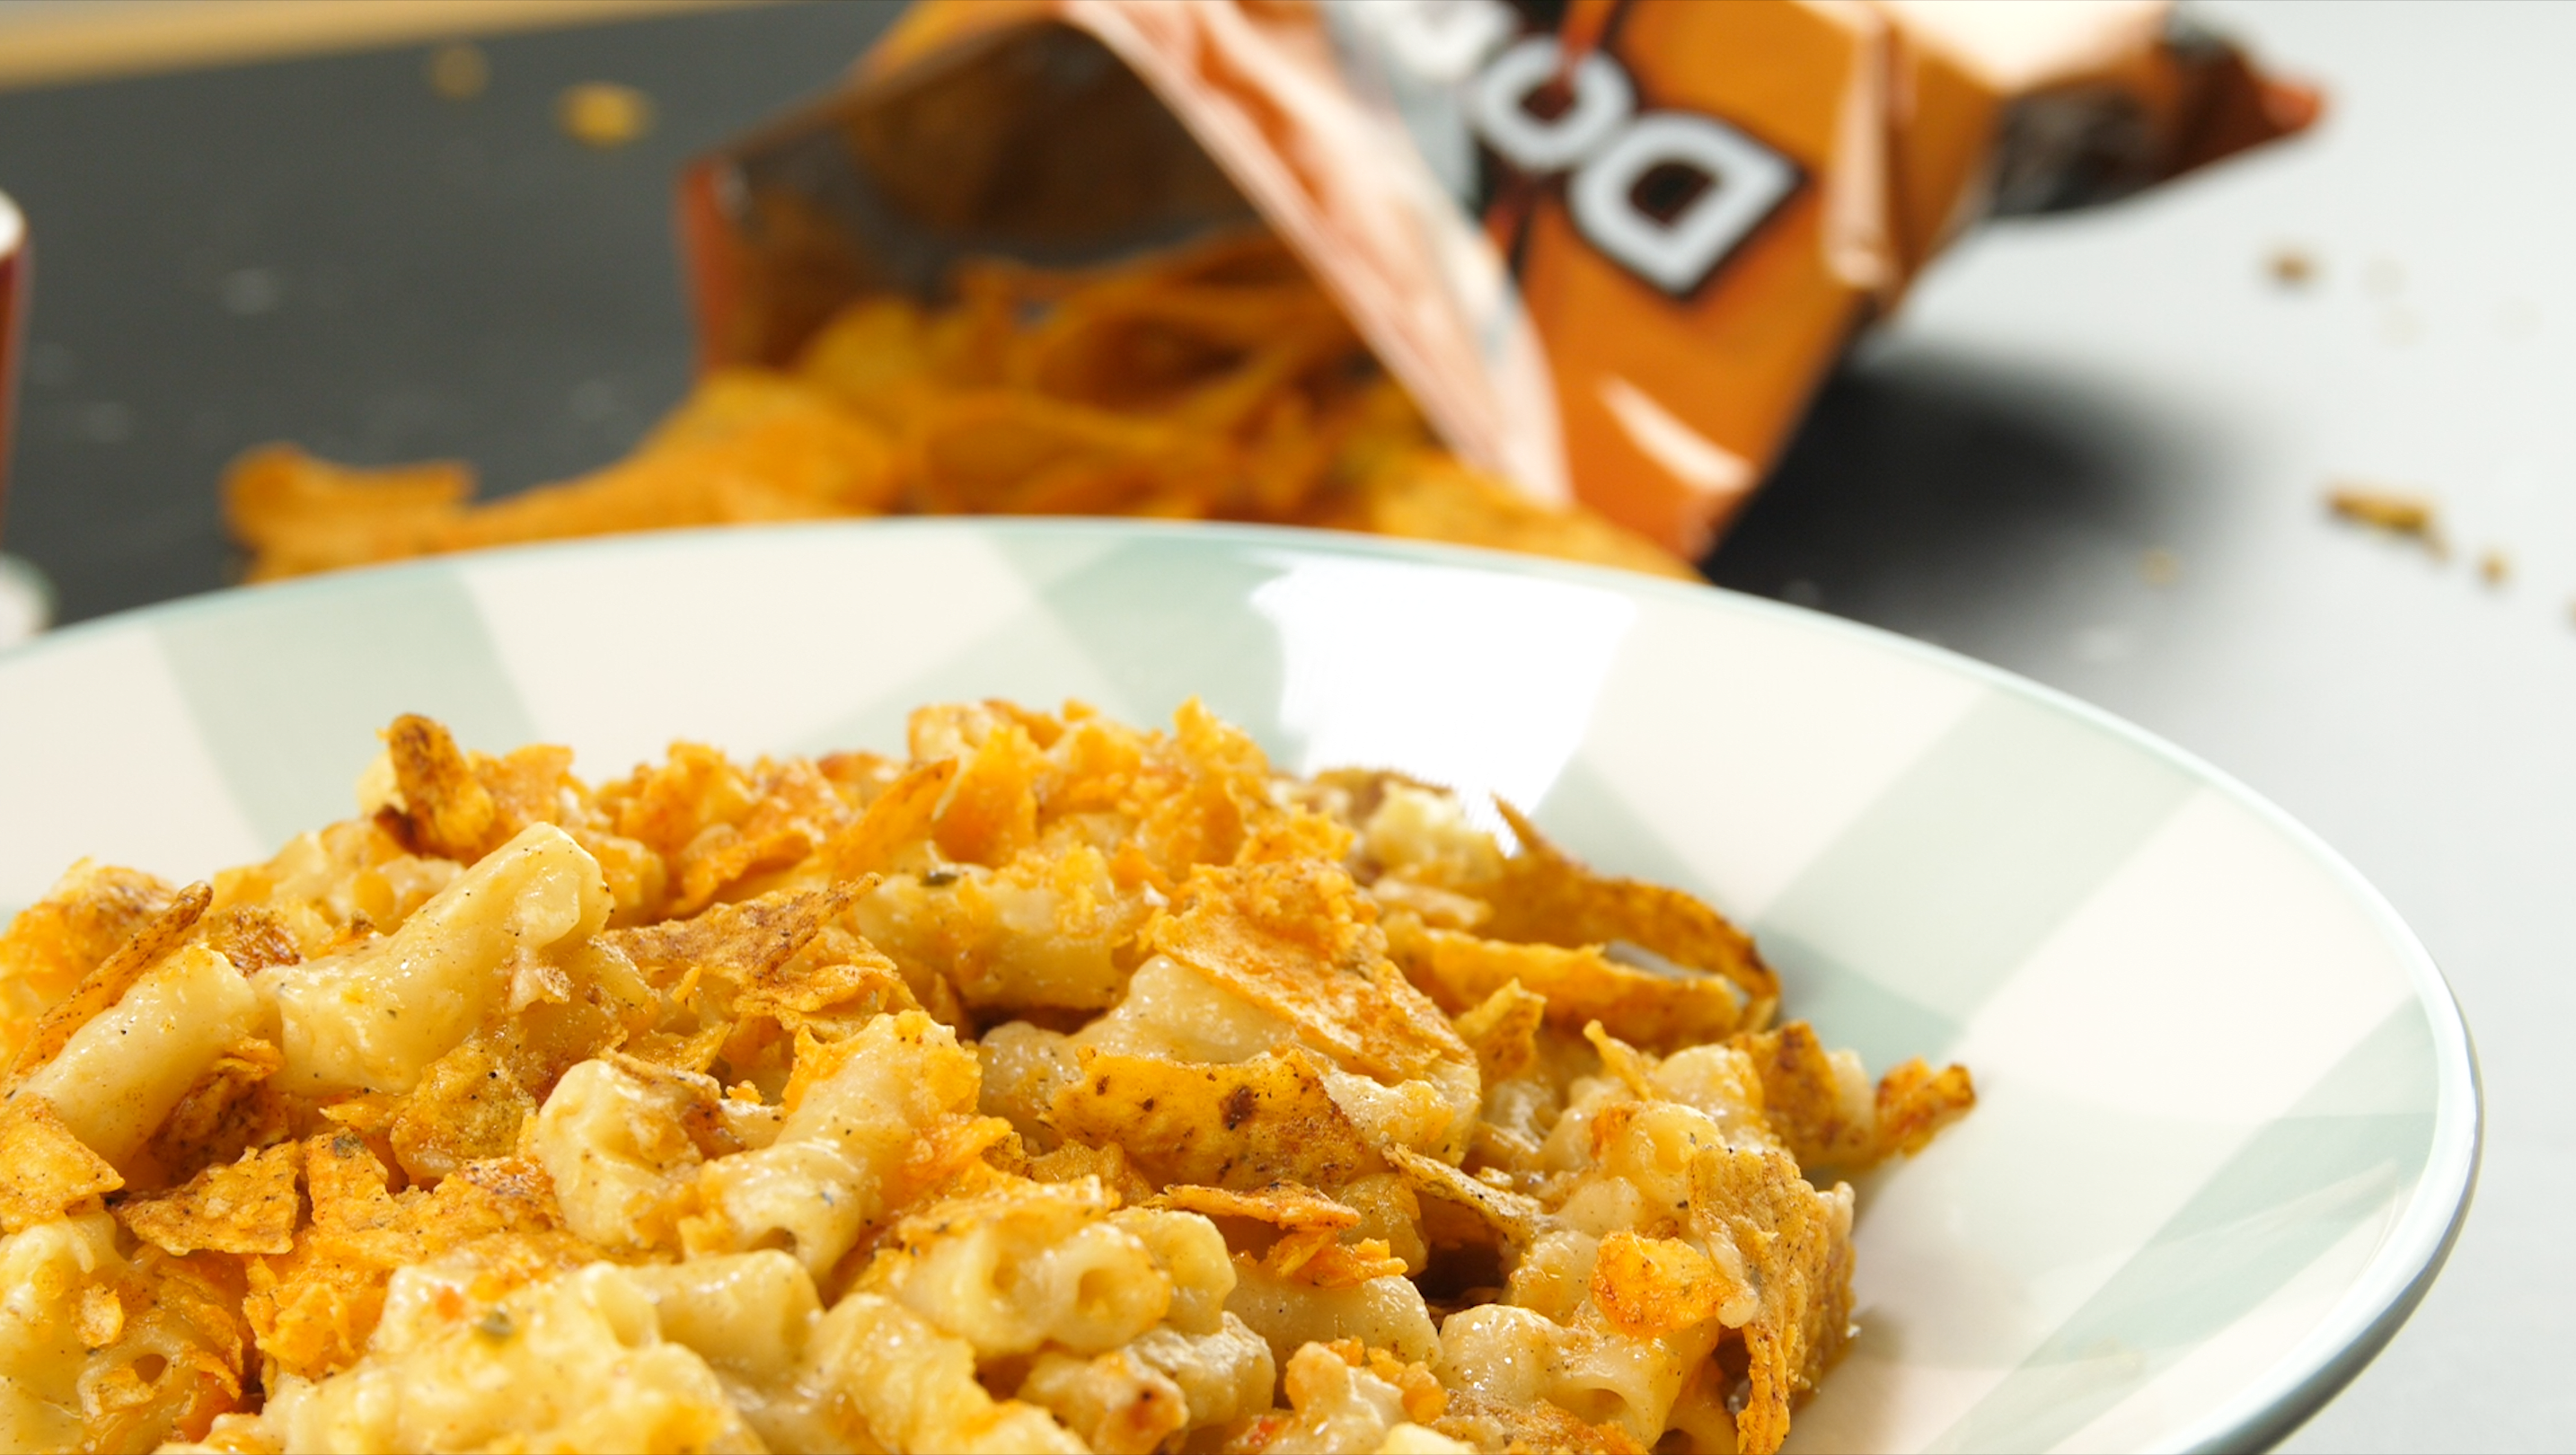 B&M Lifestyle | Recipe: Doritos Mac 'n' Cheese